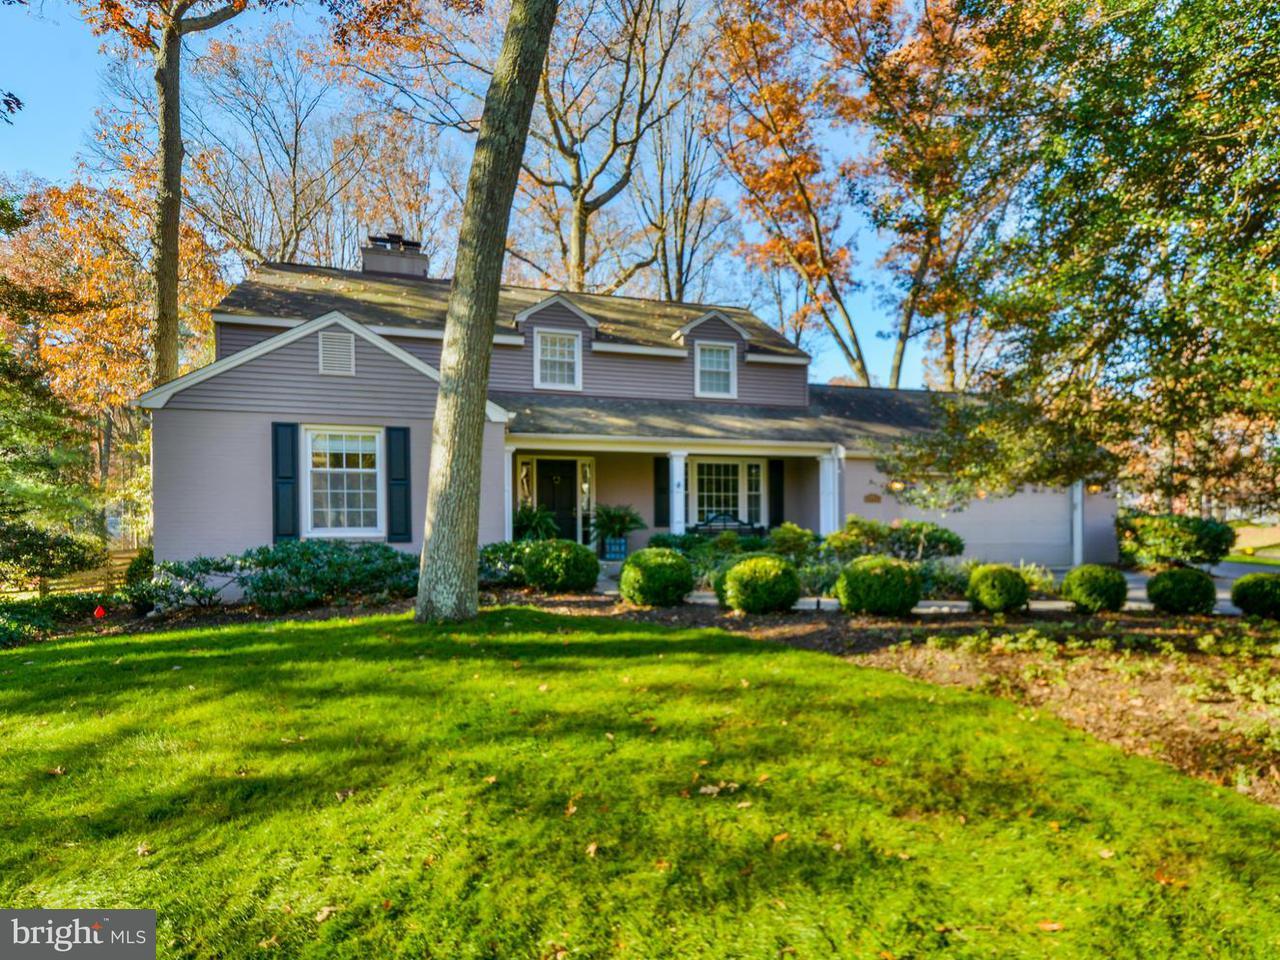 Single Family Home for Sale at 504 HEAVITREE GARTH 504 HEAVITREE GARTH Severna Park, Maryland 21146 United States